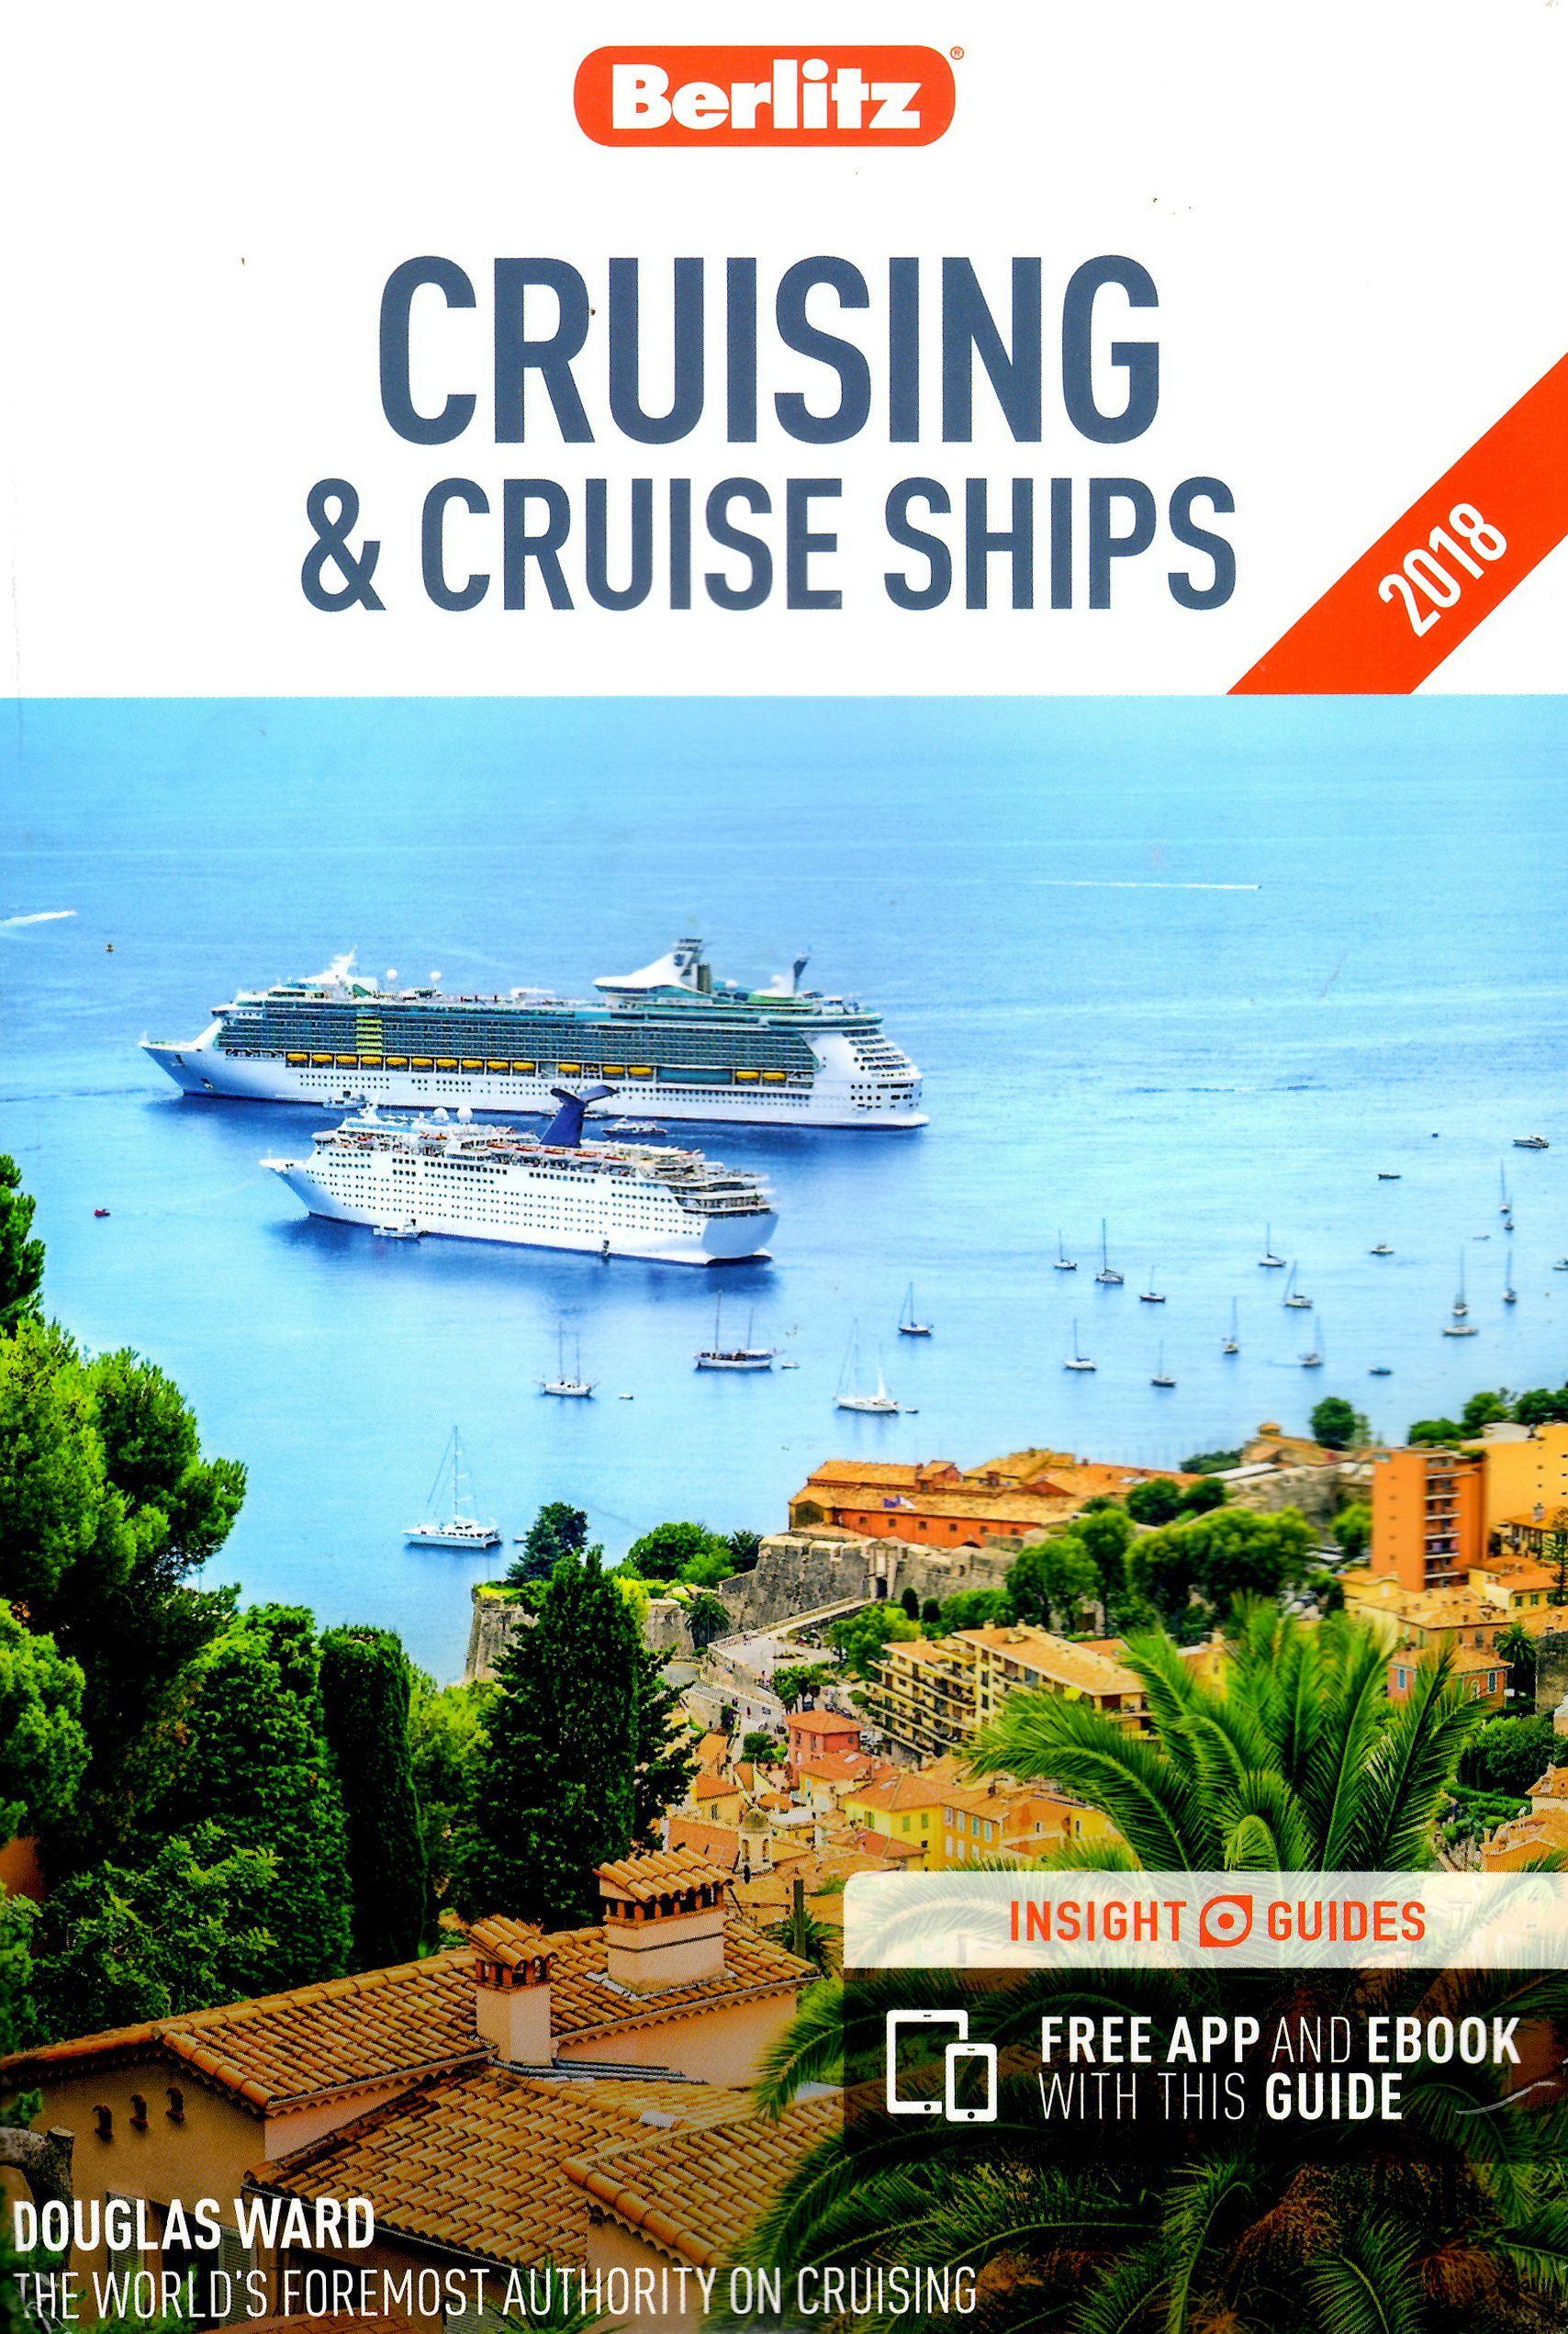 Review Of Berlitz Cruising Amp Cruise Ships 2018